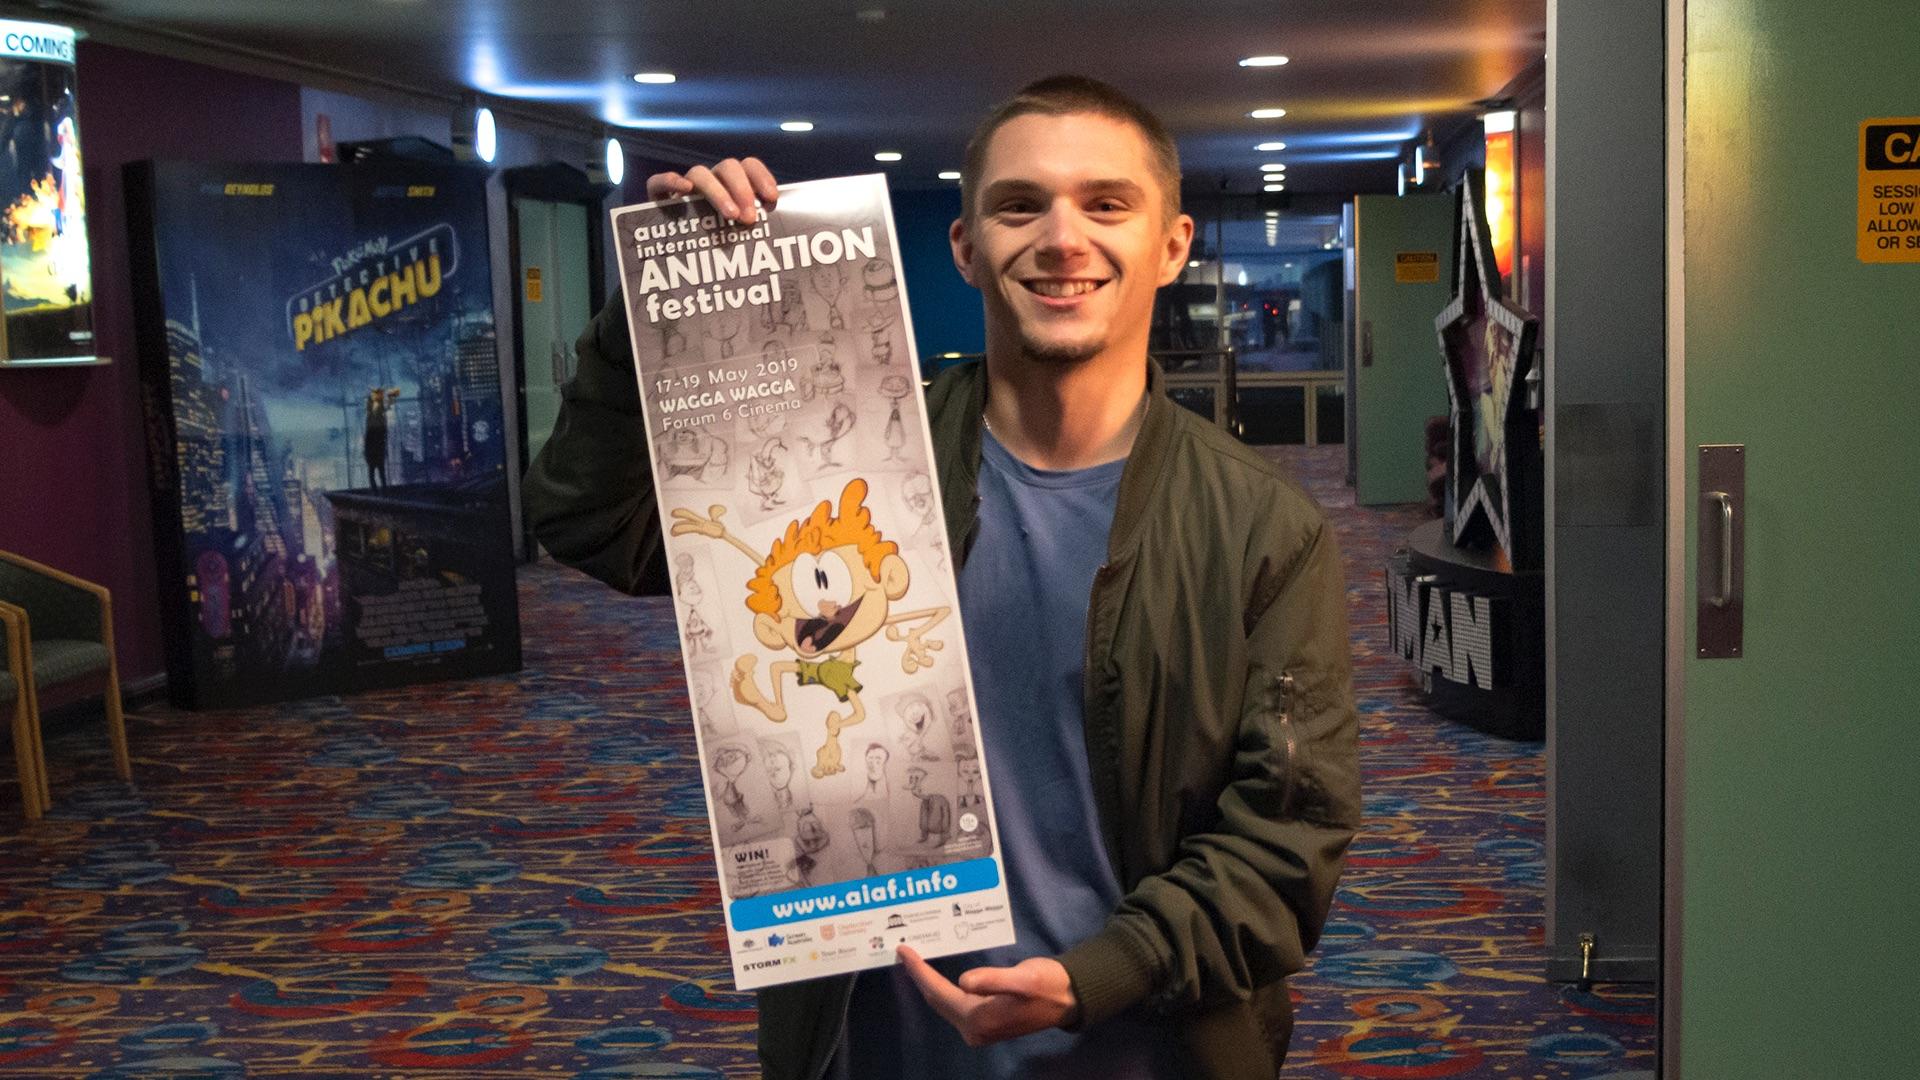 Charles Sturt University supports Australian International Animation Festival